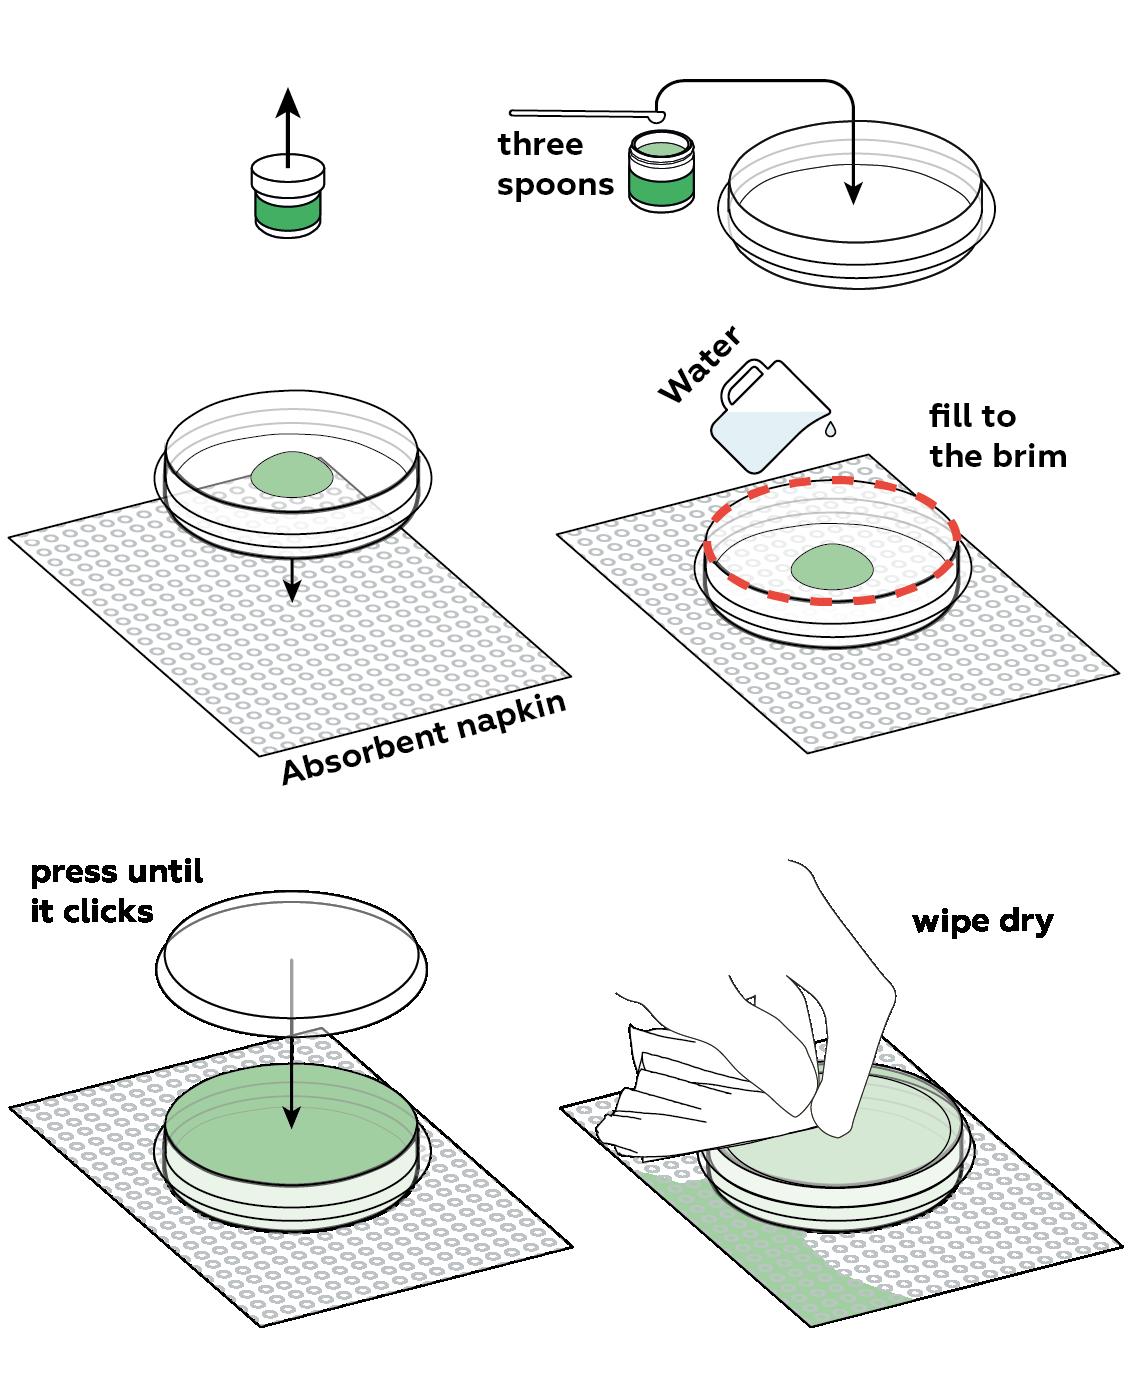 physics-rheoscopic-fluid_3-kalliroscope_en_iks_02